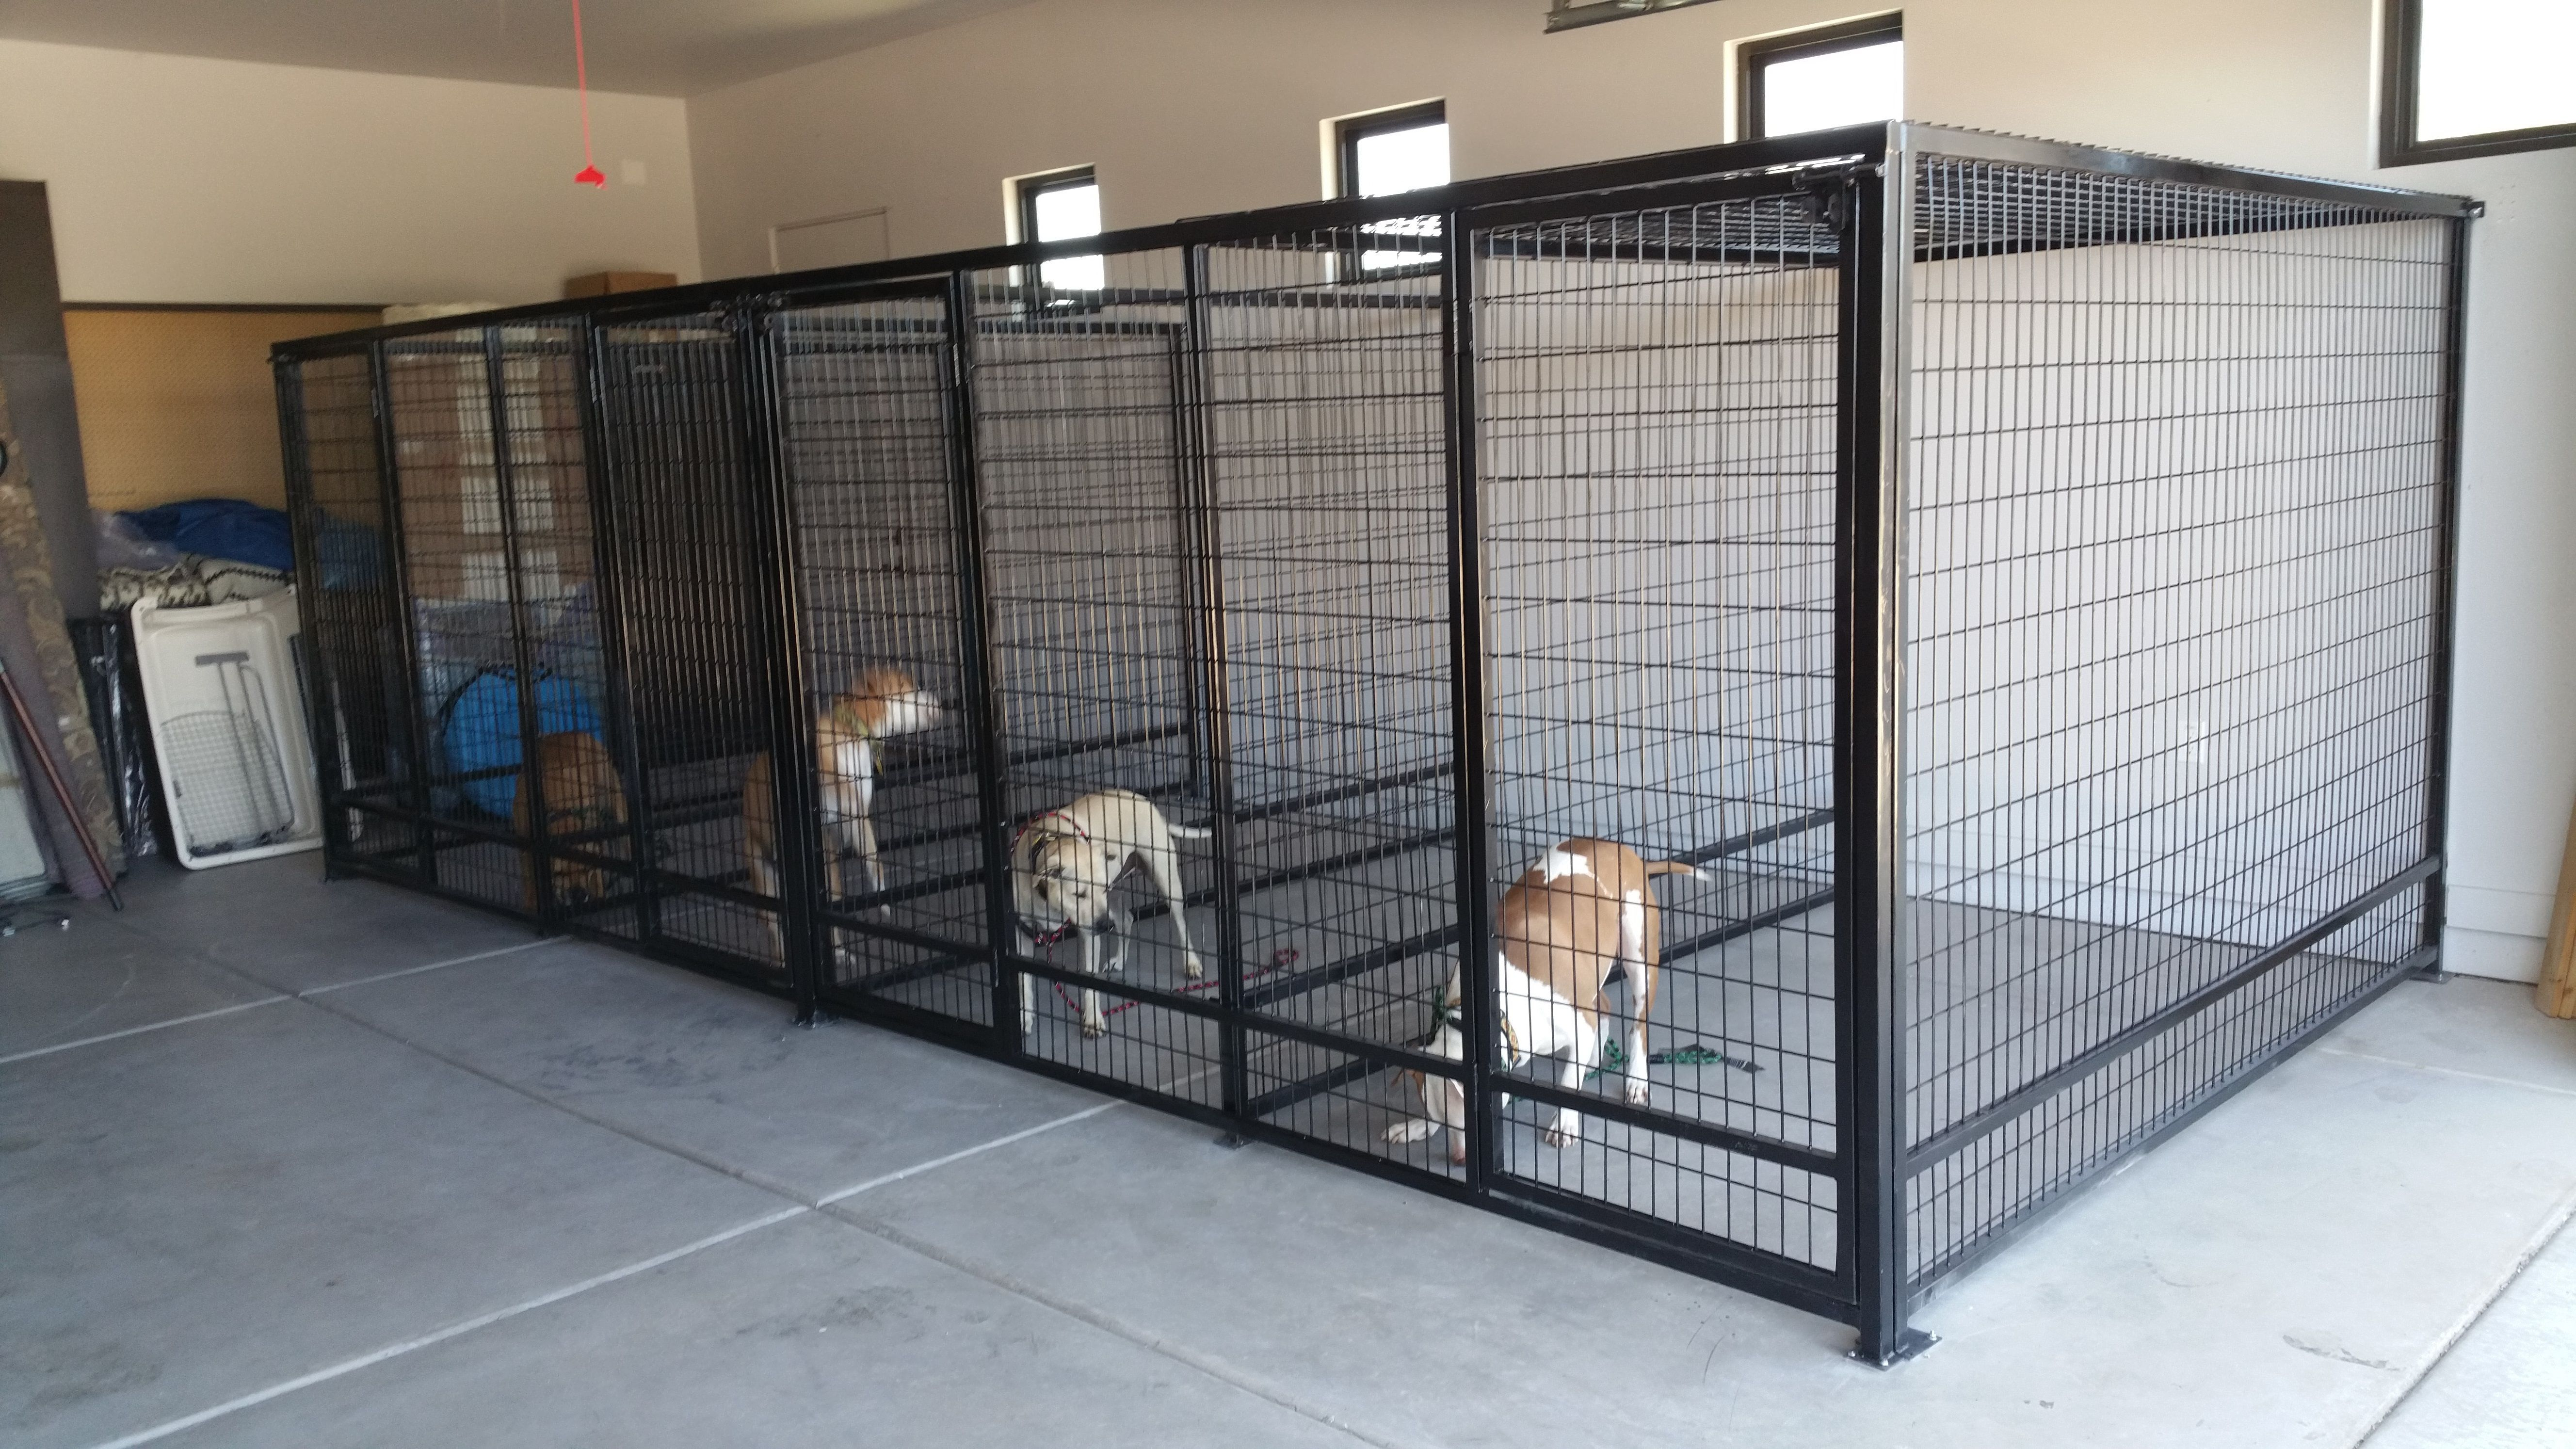 Interior Garage Kennels Installed Dogcratekijijiottawa Indoor